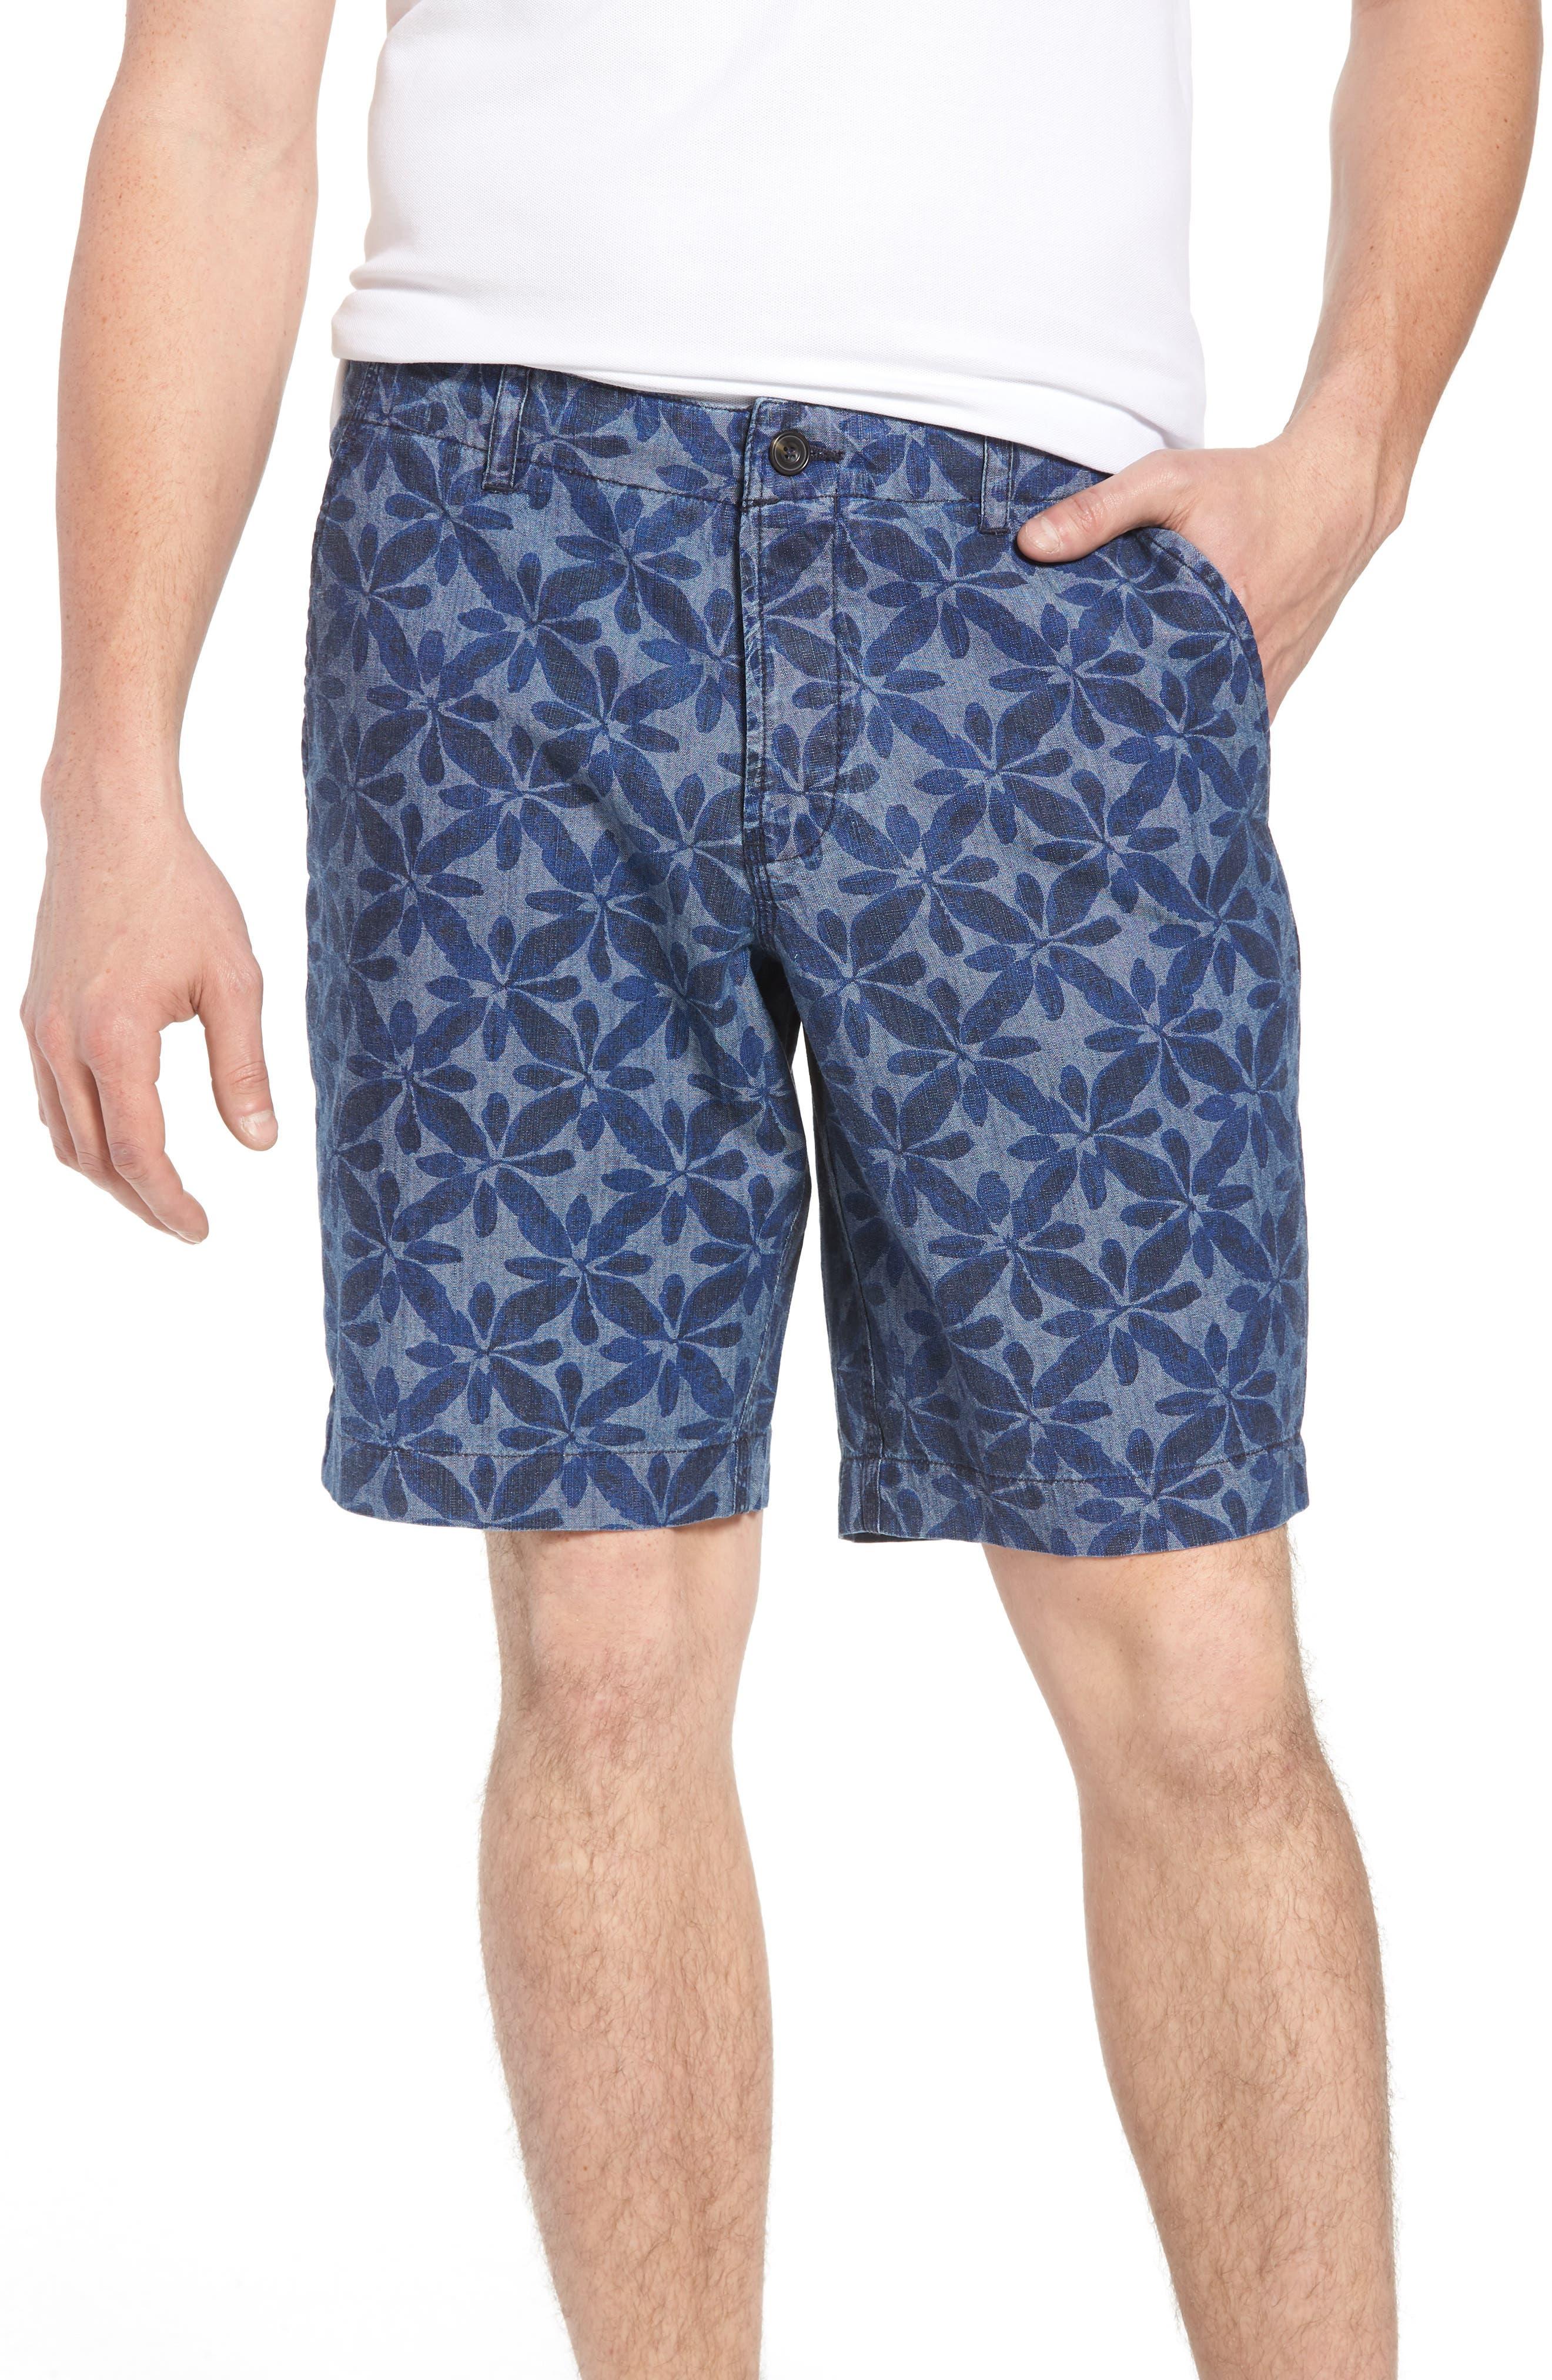 Franju Floral Cotton Shorts,                         Main,                         color, Rinse And Softener